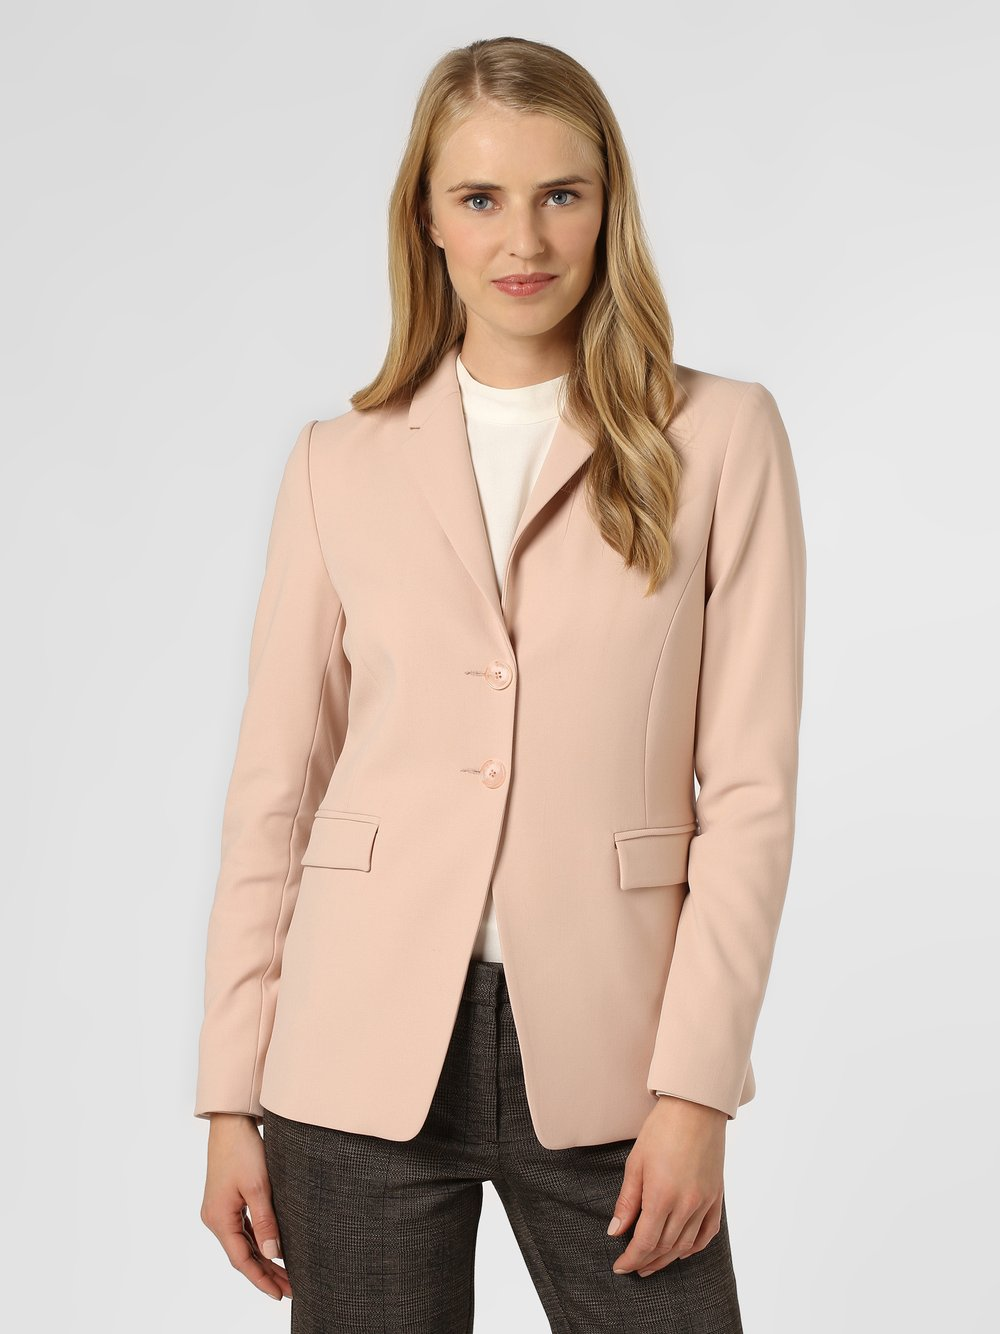 Apriori – Blezer damski, różowy Van Graaf 453187-0001-00440